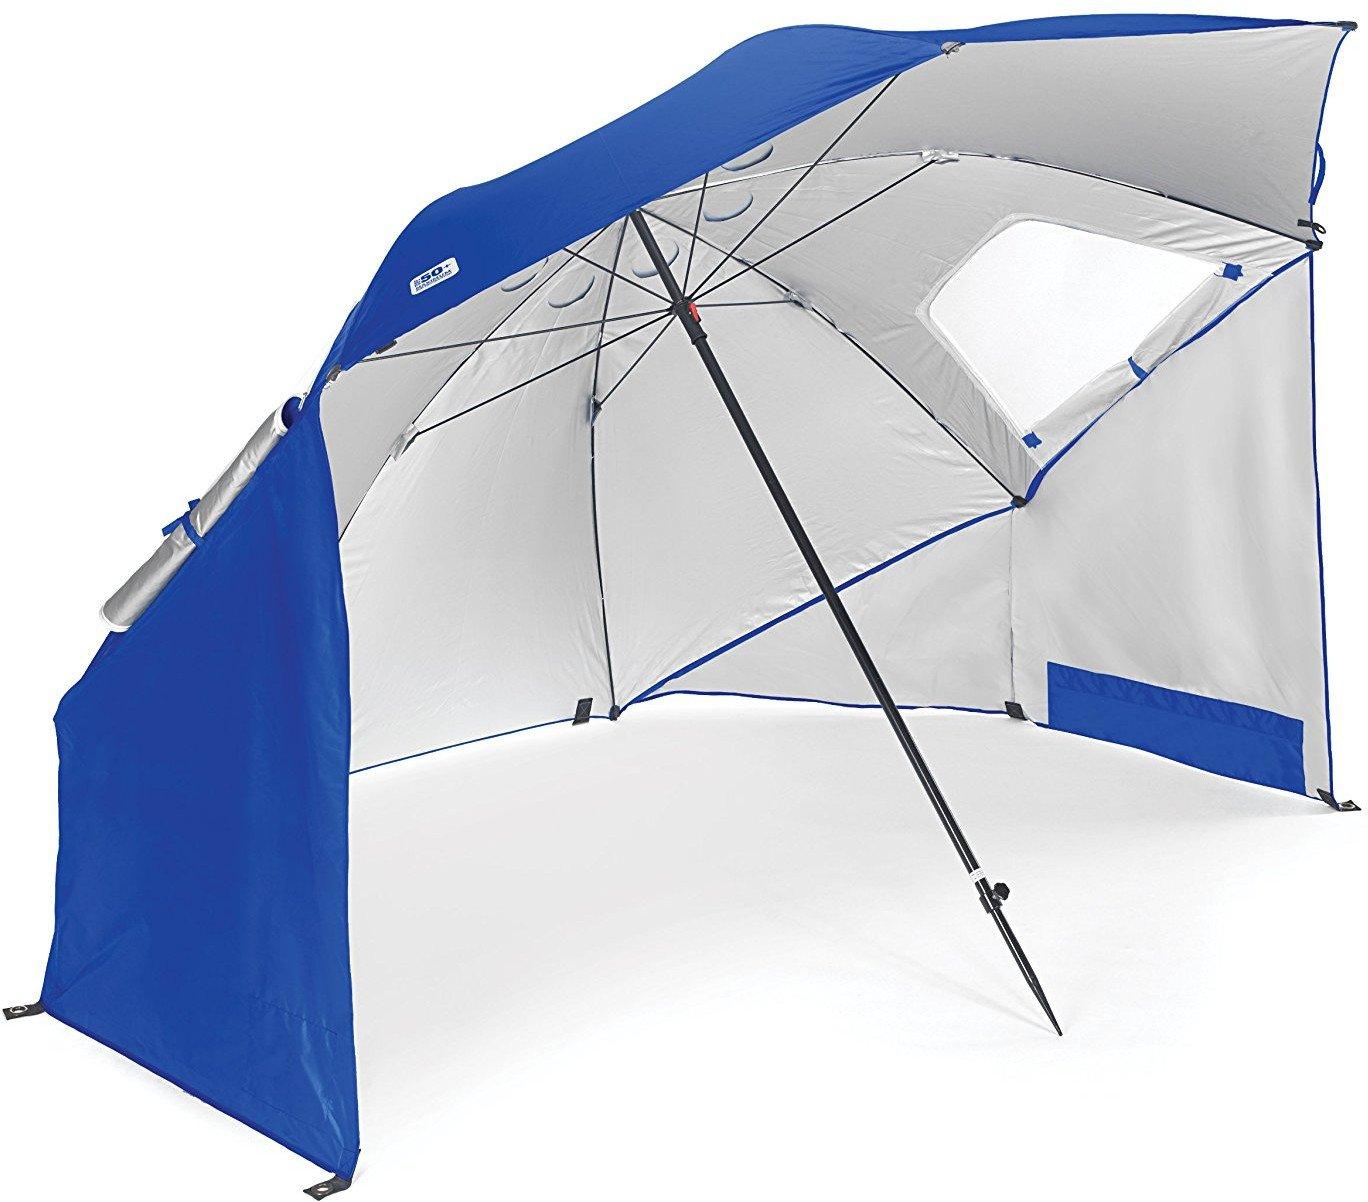 Sport Brella Portable All Weather Umbrella 8 Foot